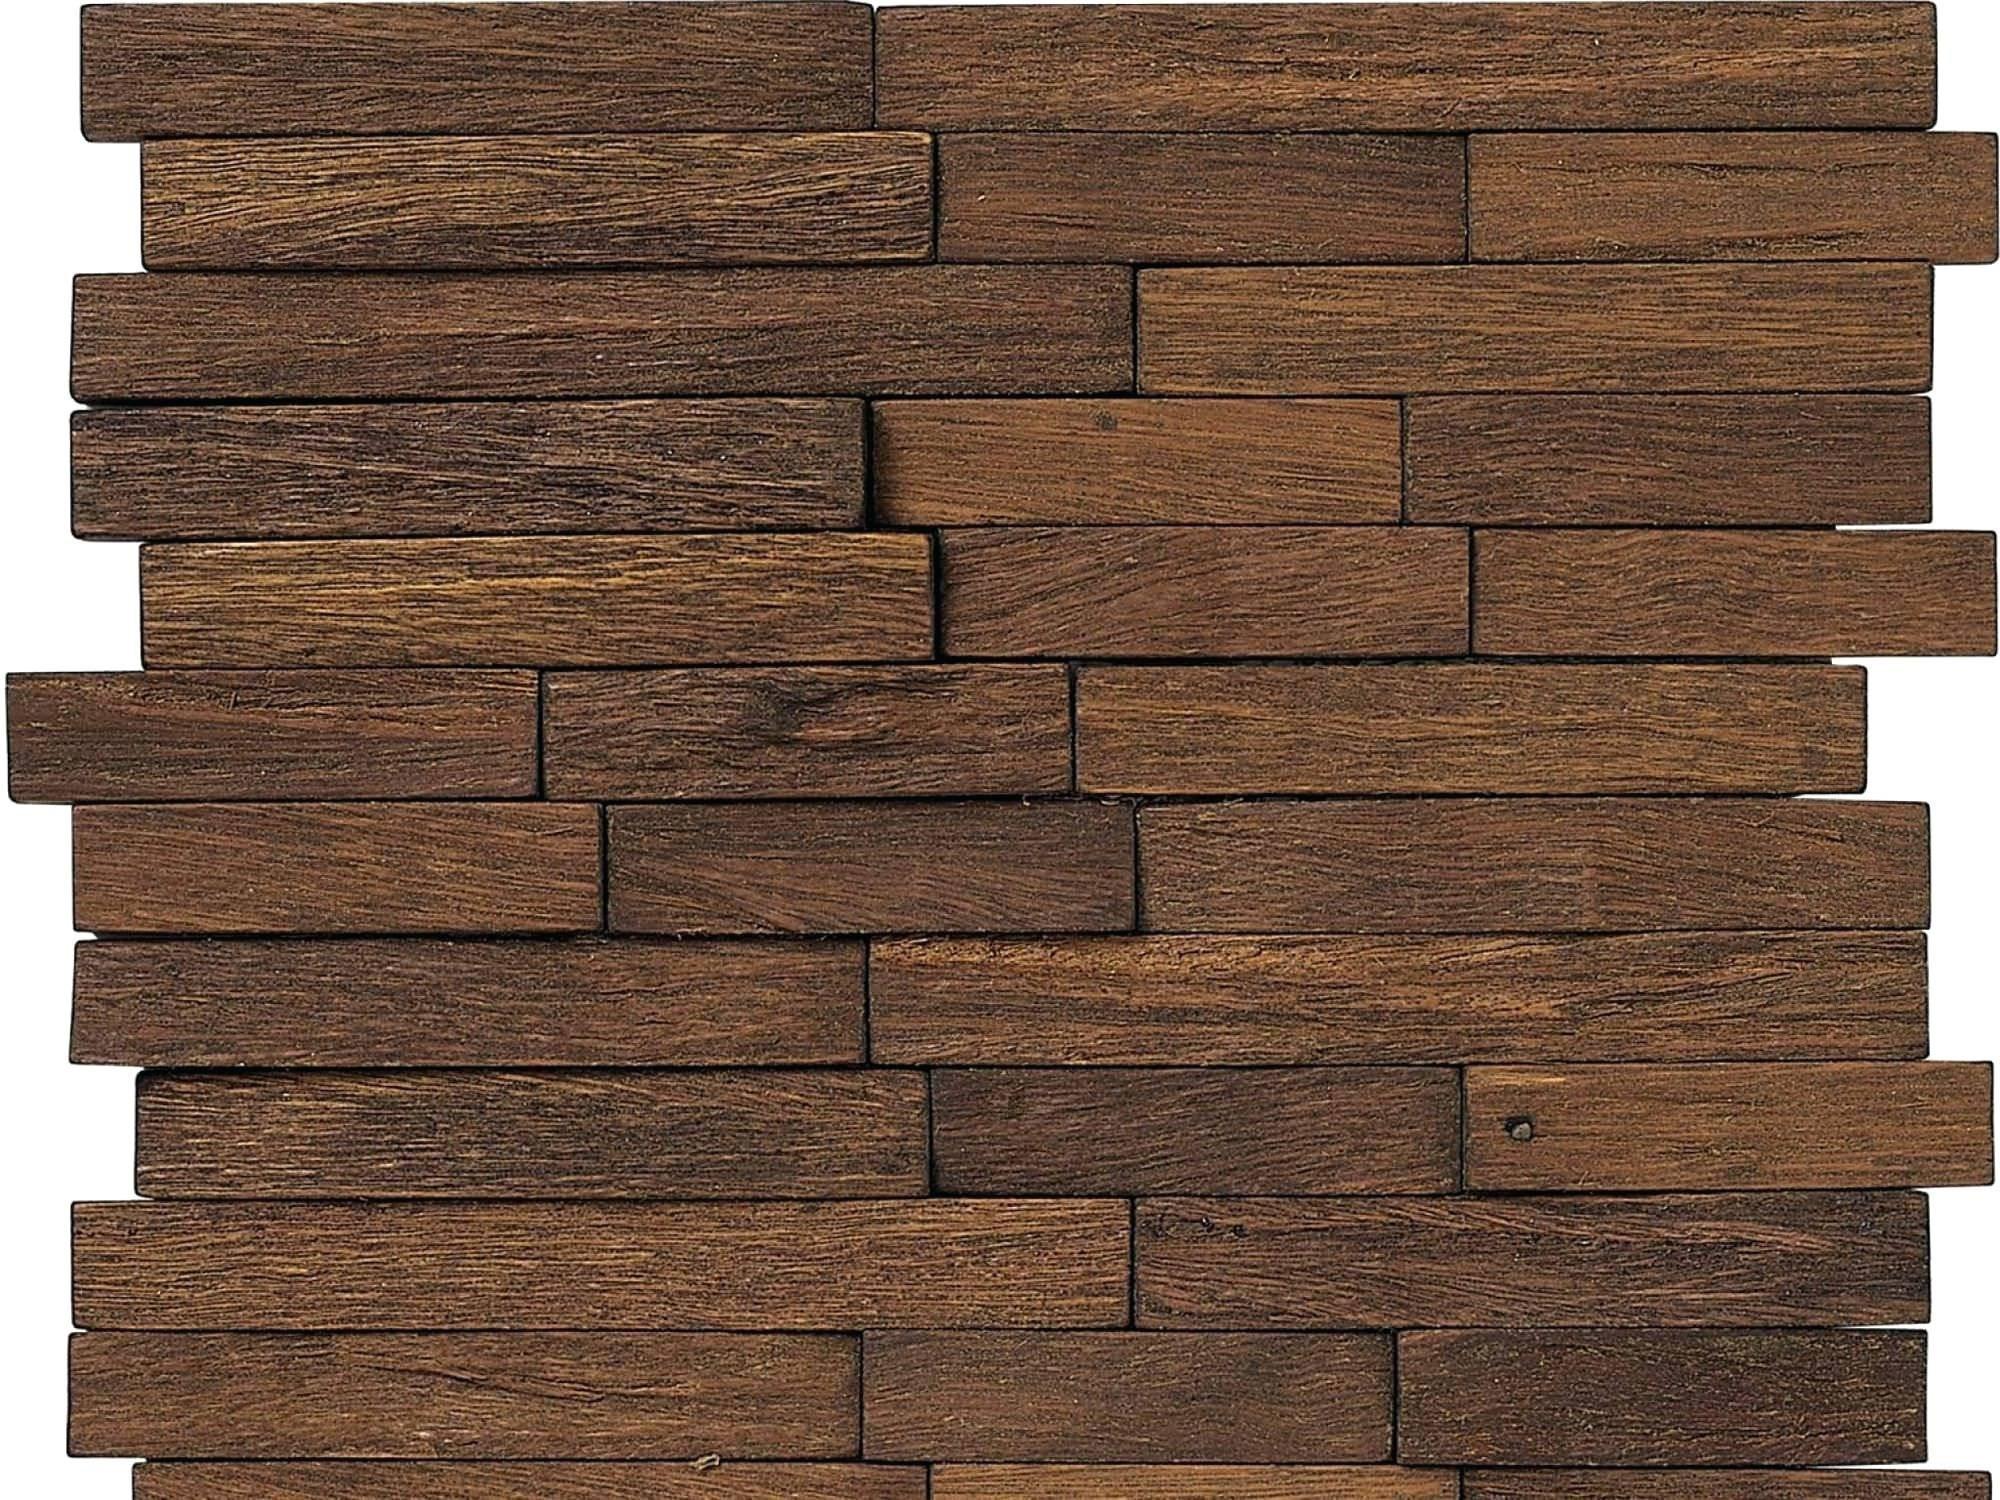 Hardwood Floor Refinishing Metro Detroit Of the Wood Maker Page 2 Wood Wallpaper for New Metal Wall Art Panels Fresh 1 Kirkland Wall Decor Home Design 0d Ideas Of Wood 30 Inspirational Wood Floors In Kitchen Trinitycountyfoodbank